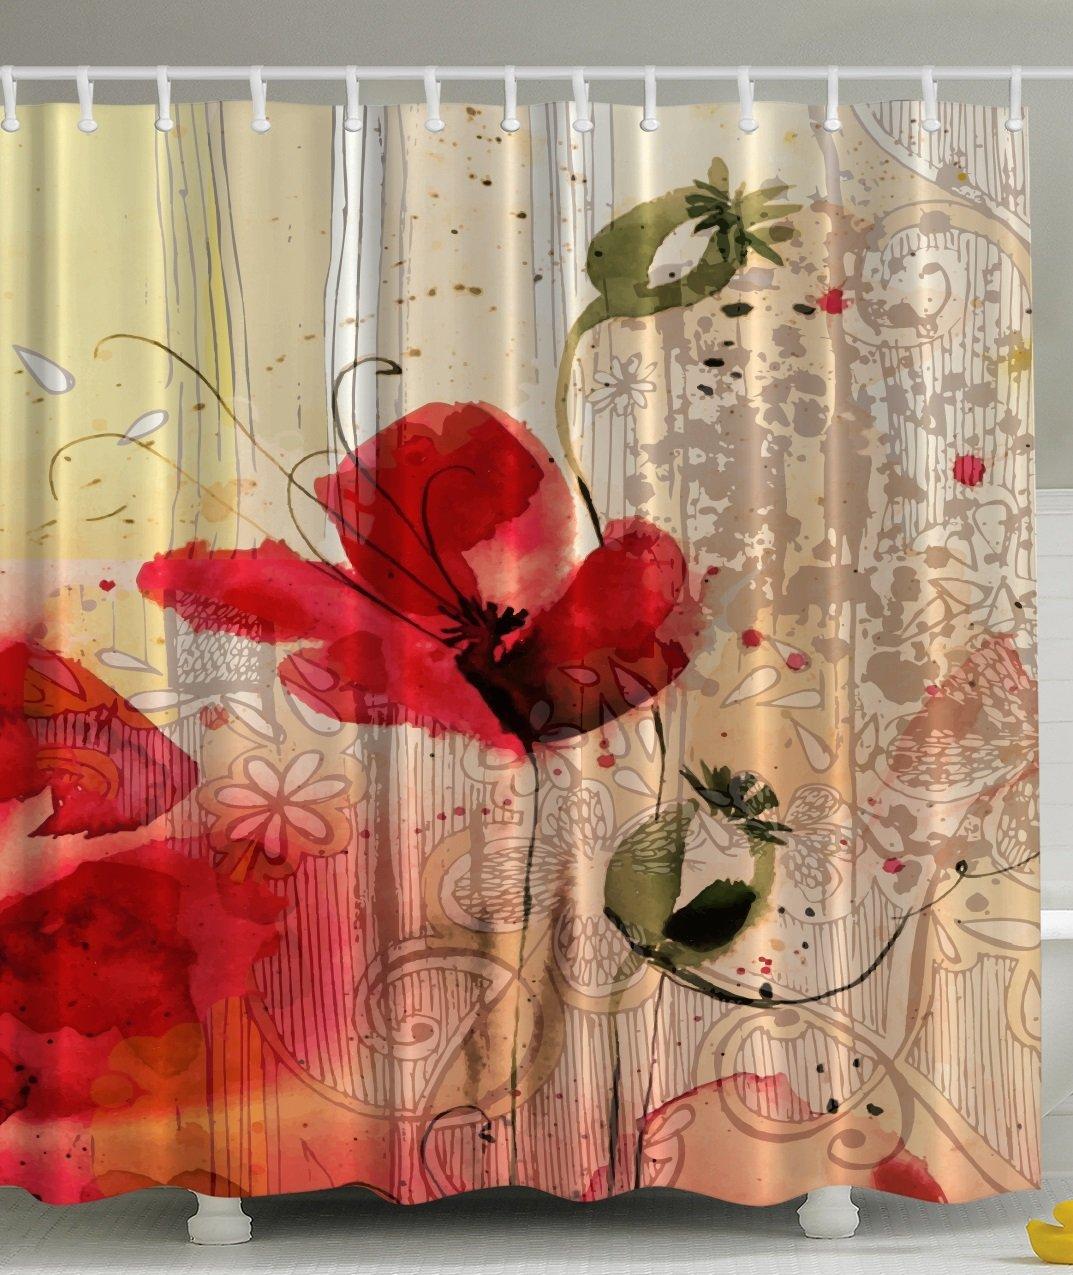 Vibrant red poppy bathroom accessories for Bathroom paintings amazon